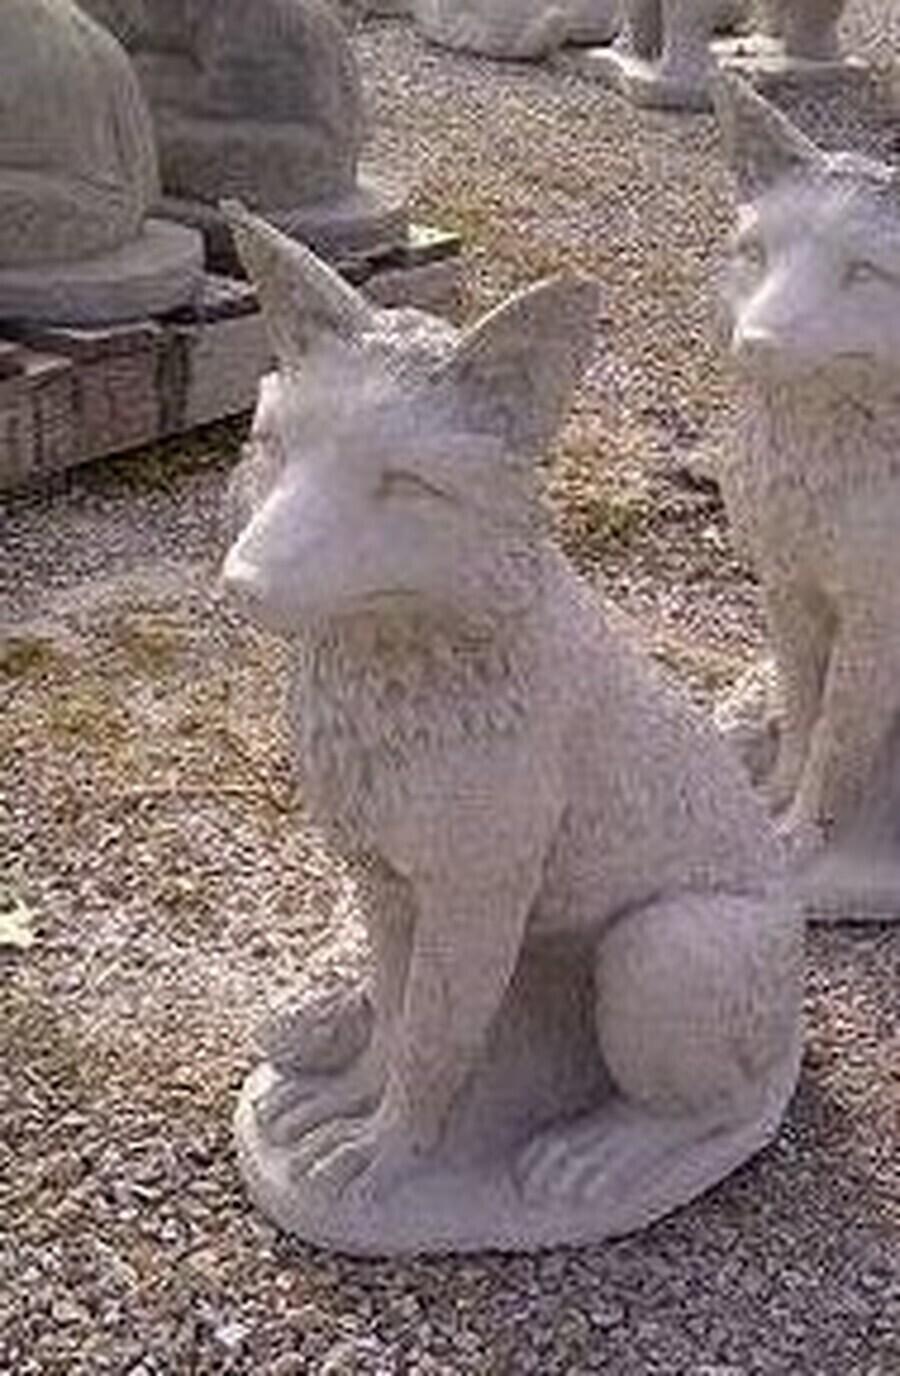 Detailed Sitting Fox